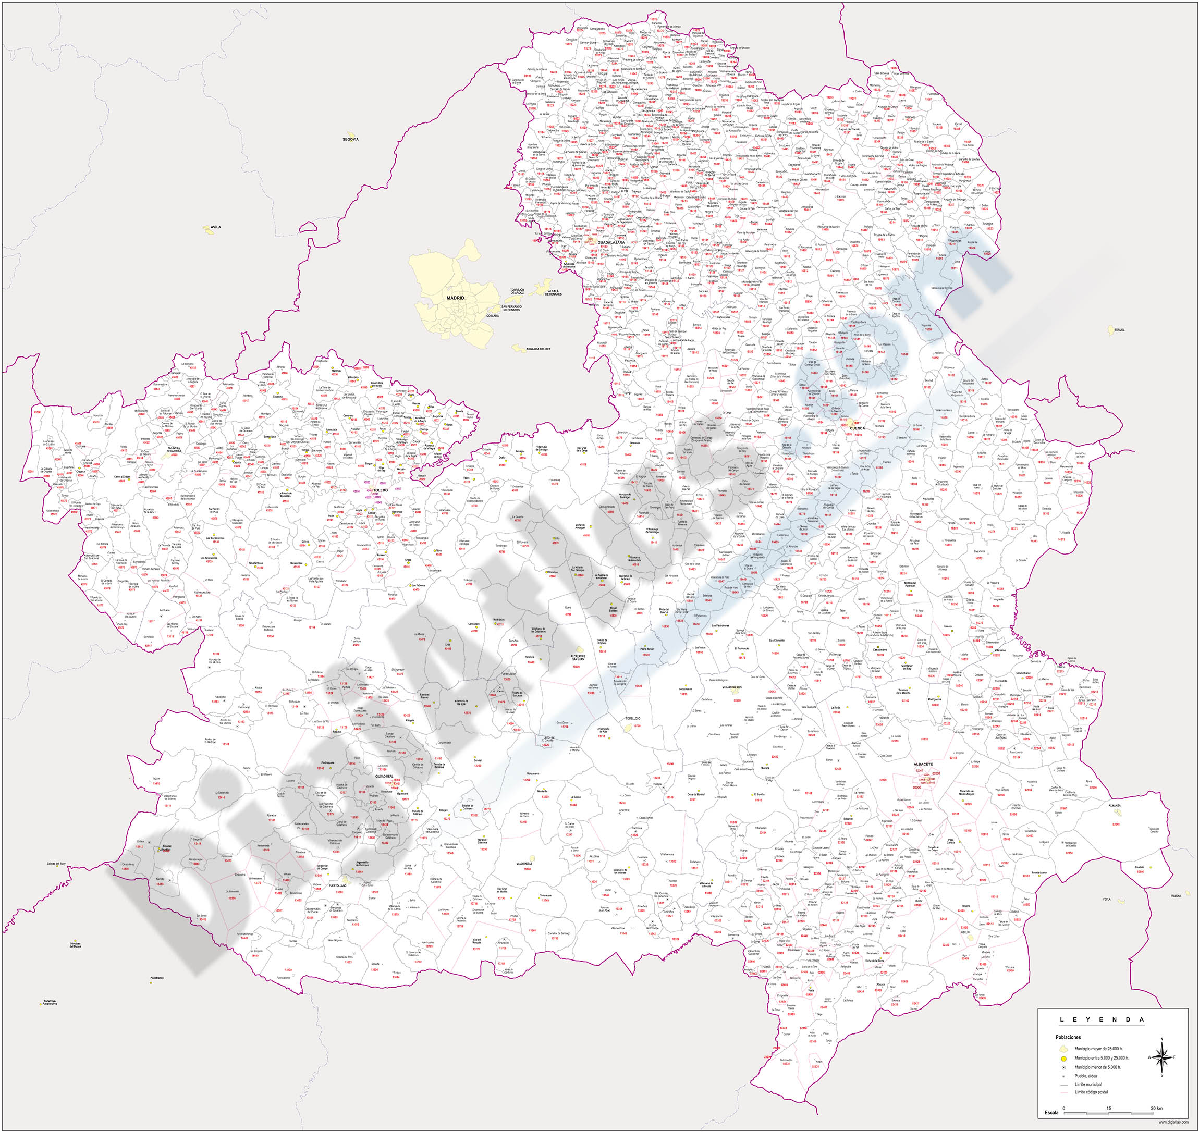 Castile-La Mancha - map of postal codes and municipalities